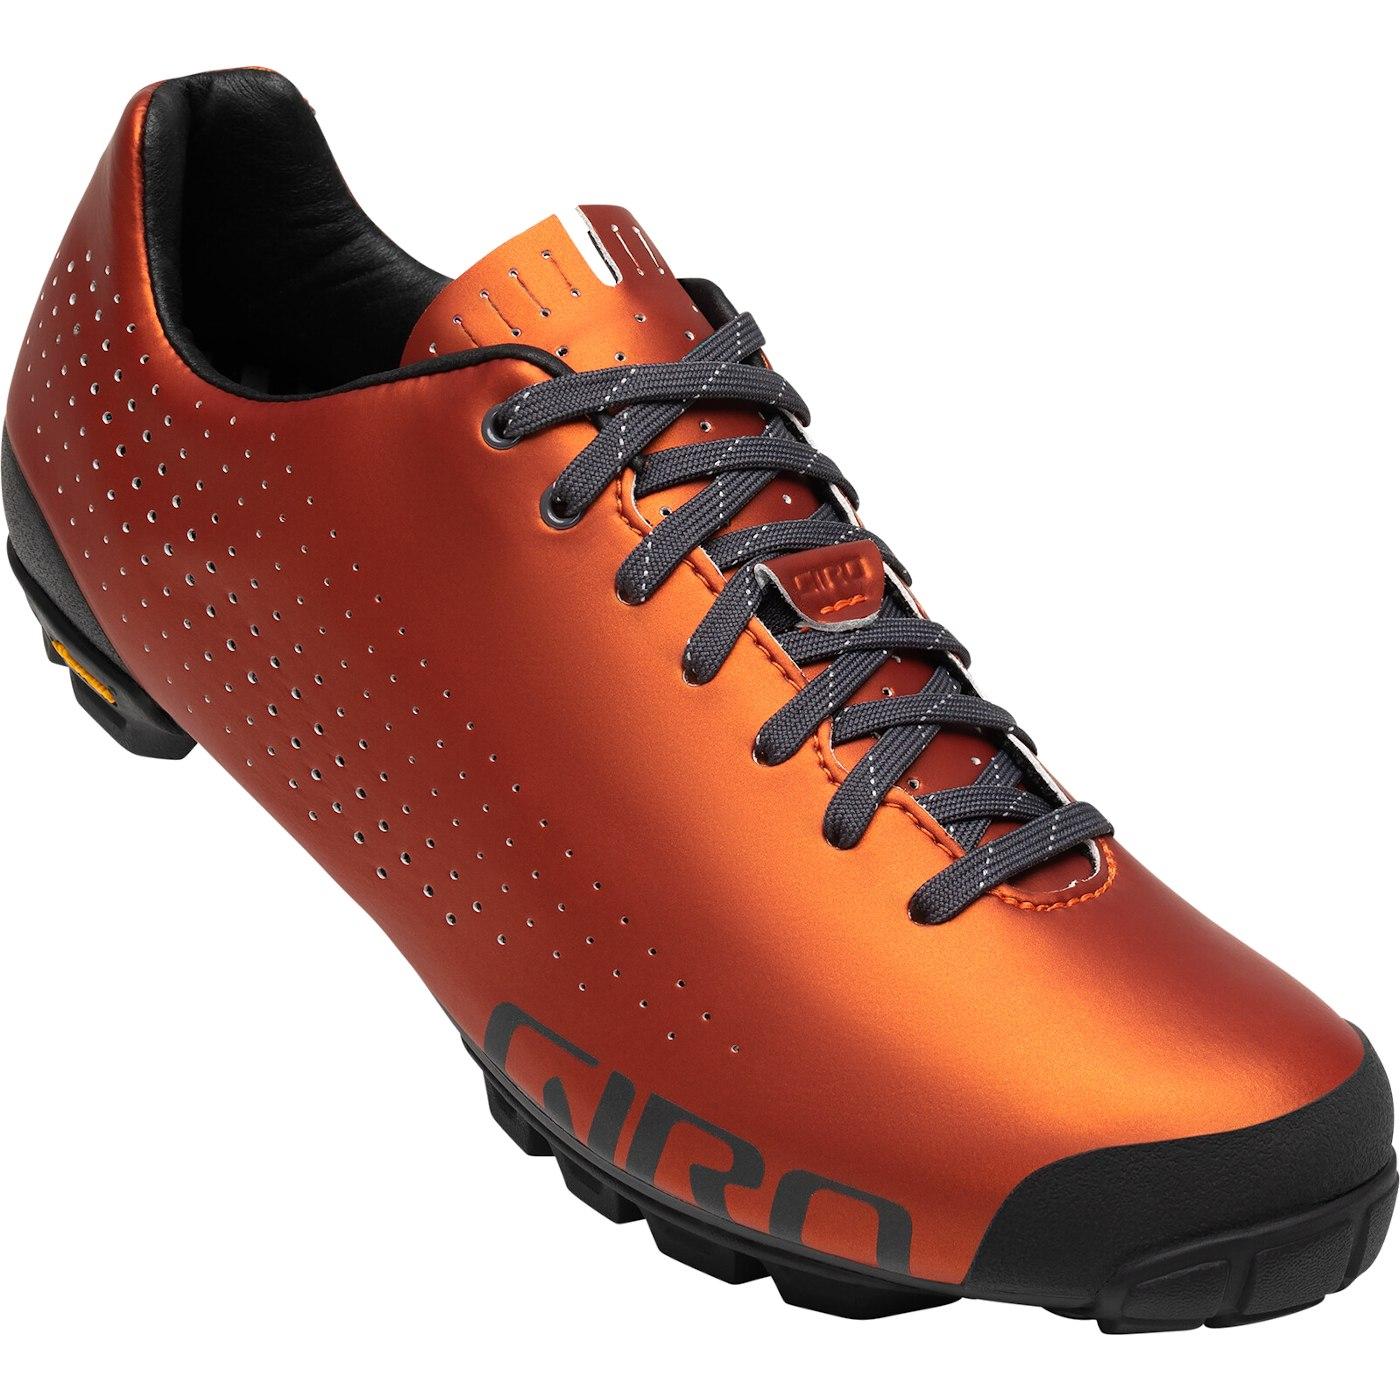 Čevlji giro empire vr90 mtb  red orange metallic